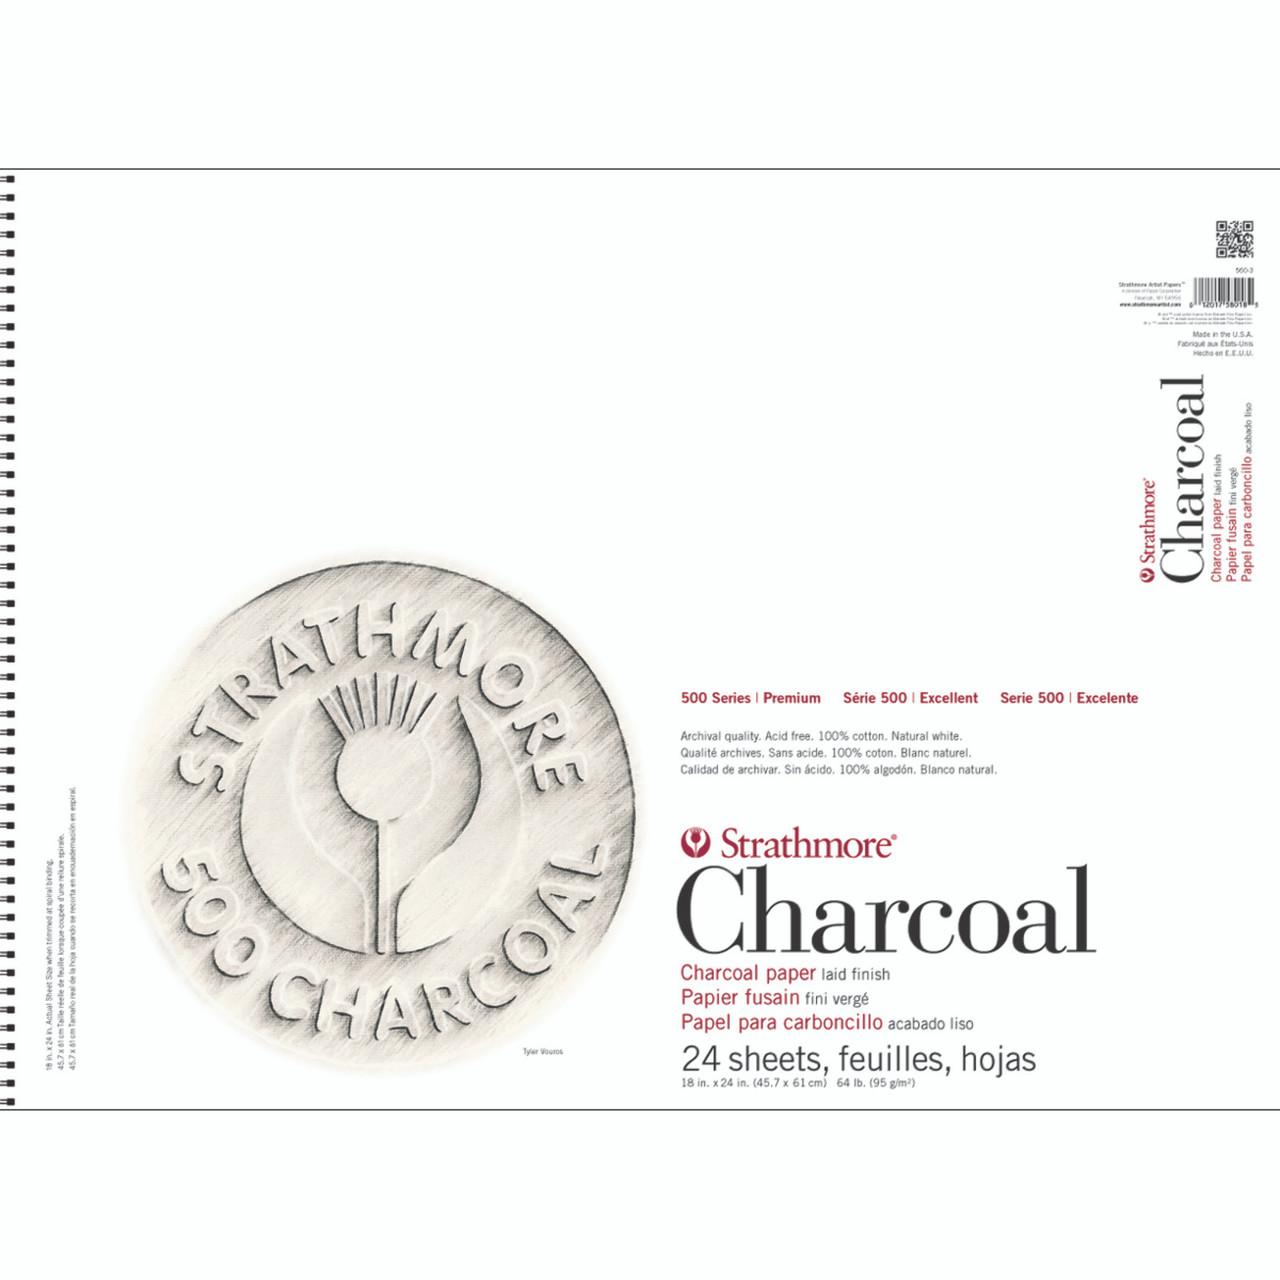 Charcoal Paper Pad Series 500 18 x 24